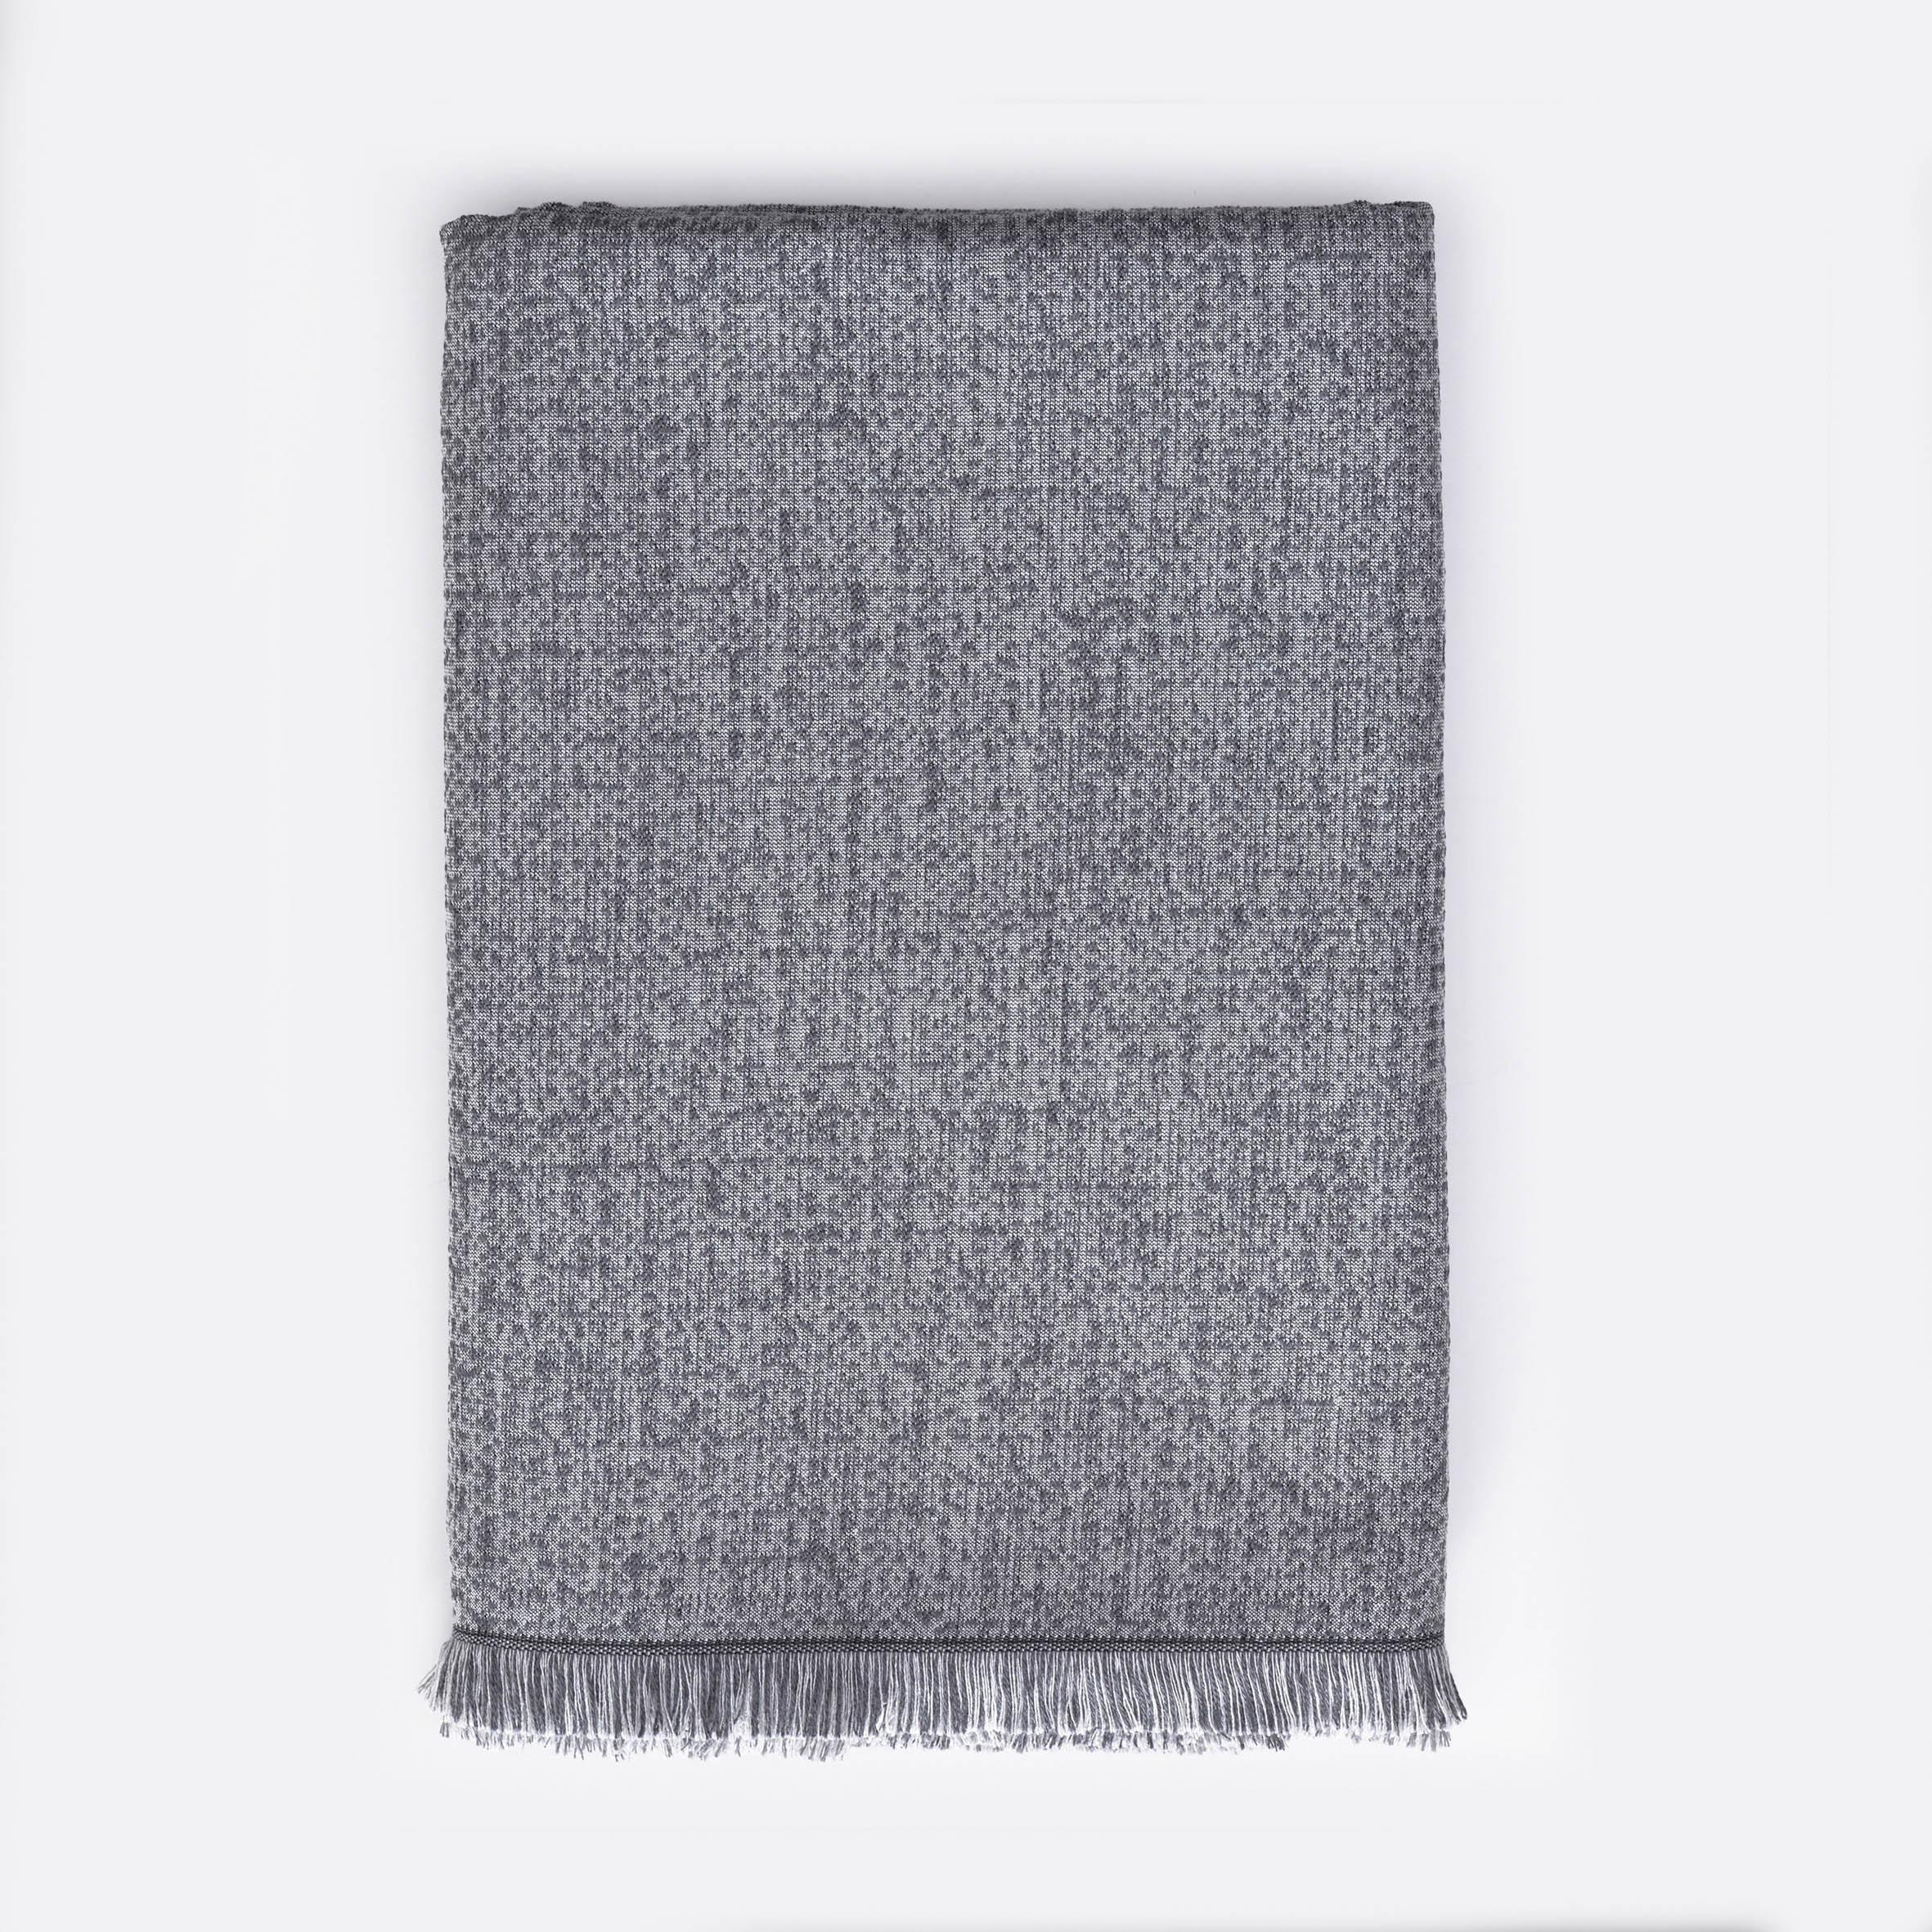 Rythmos Naigel – Ριχταρι 180X240 Γκρι